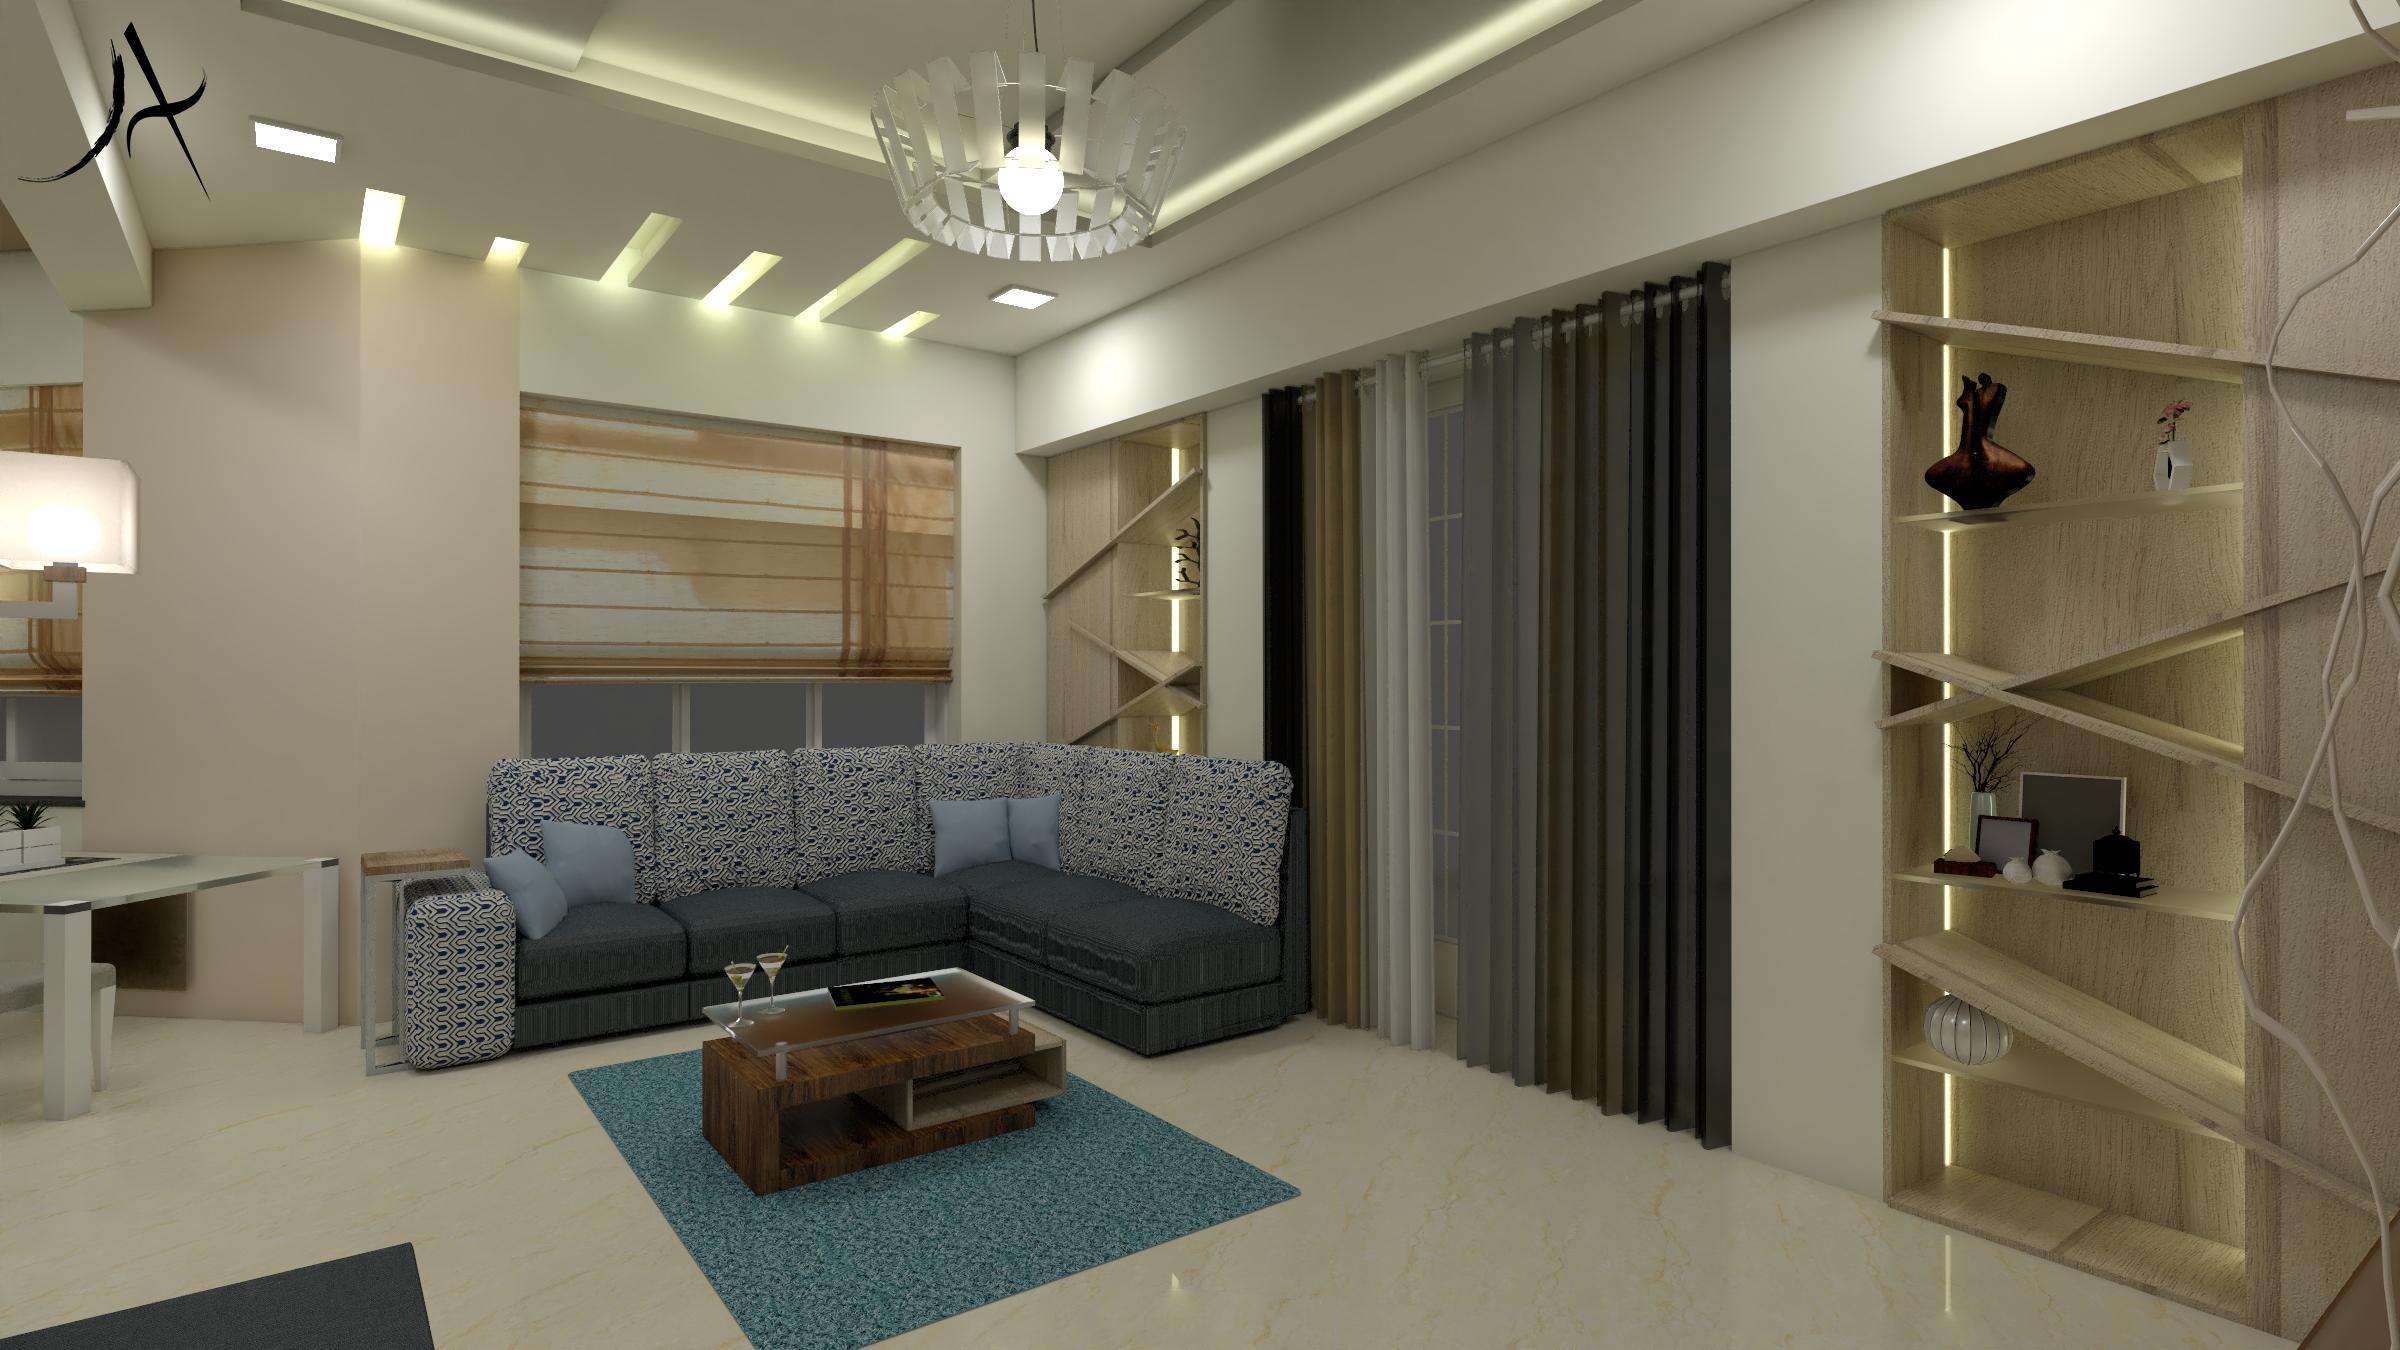 3 Hall view 3